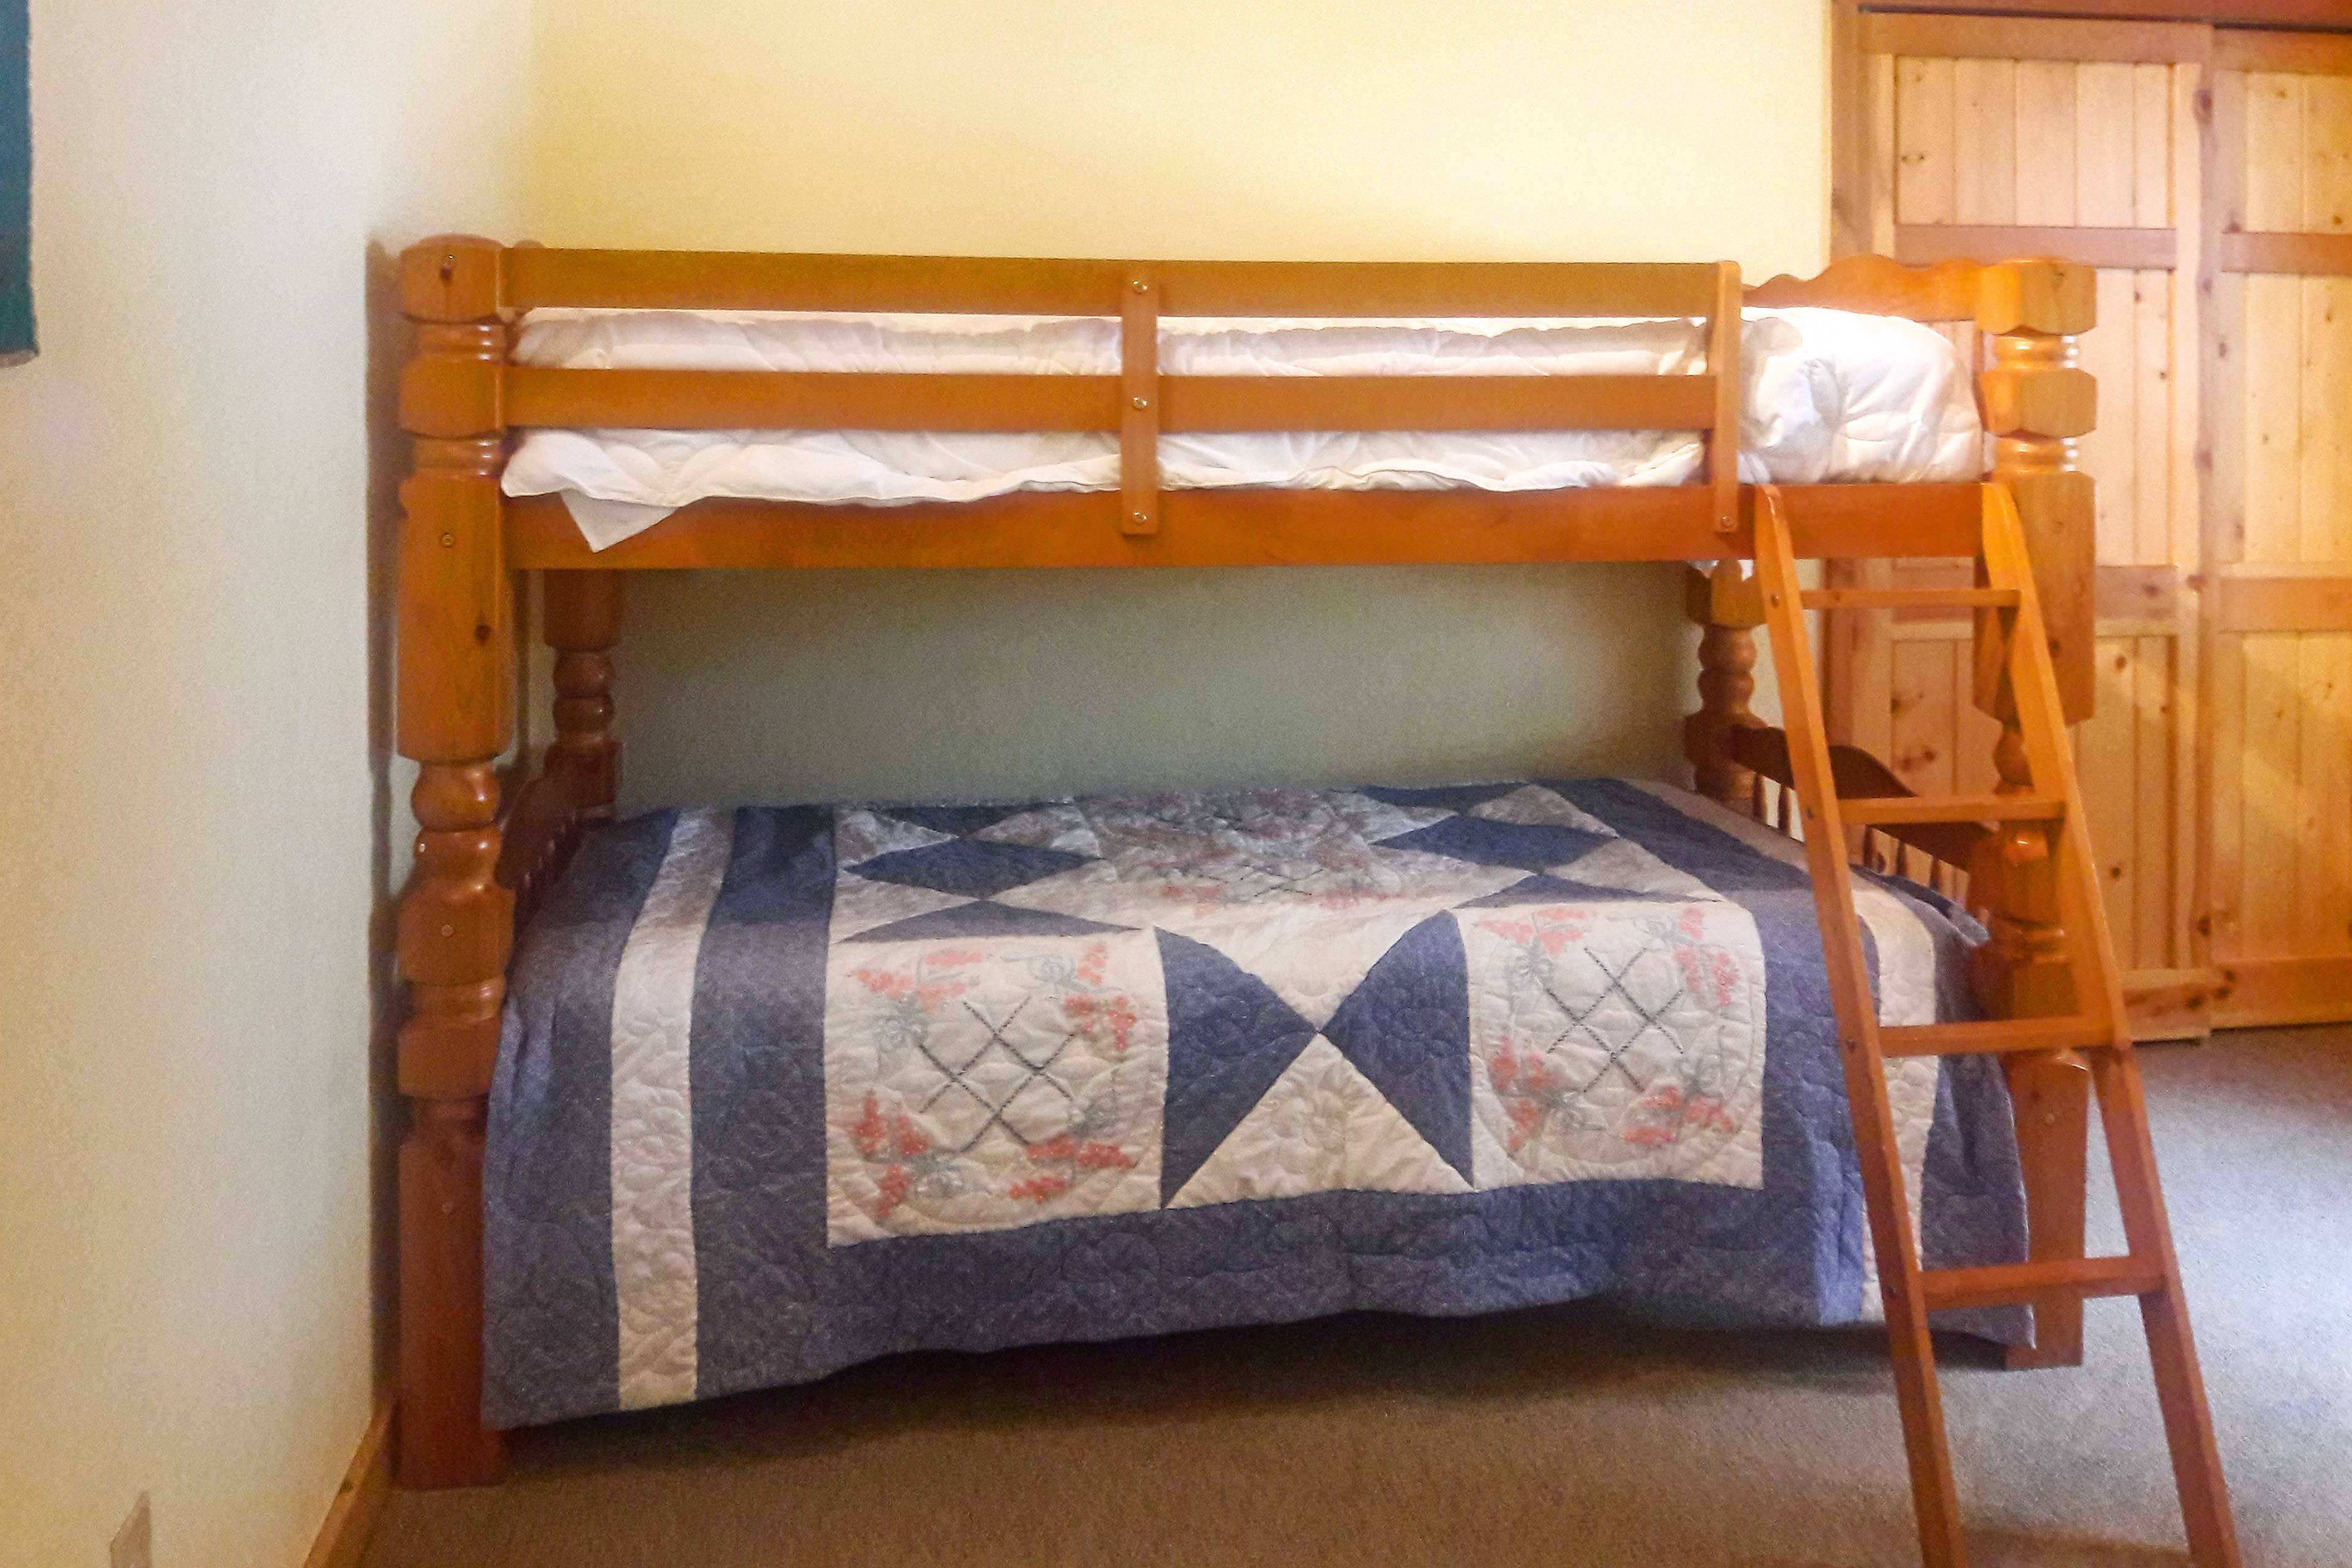 Who get top bunk?